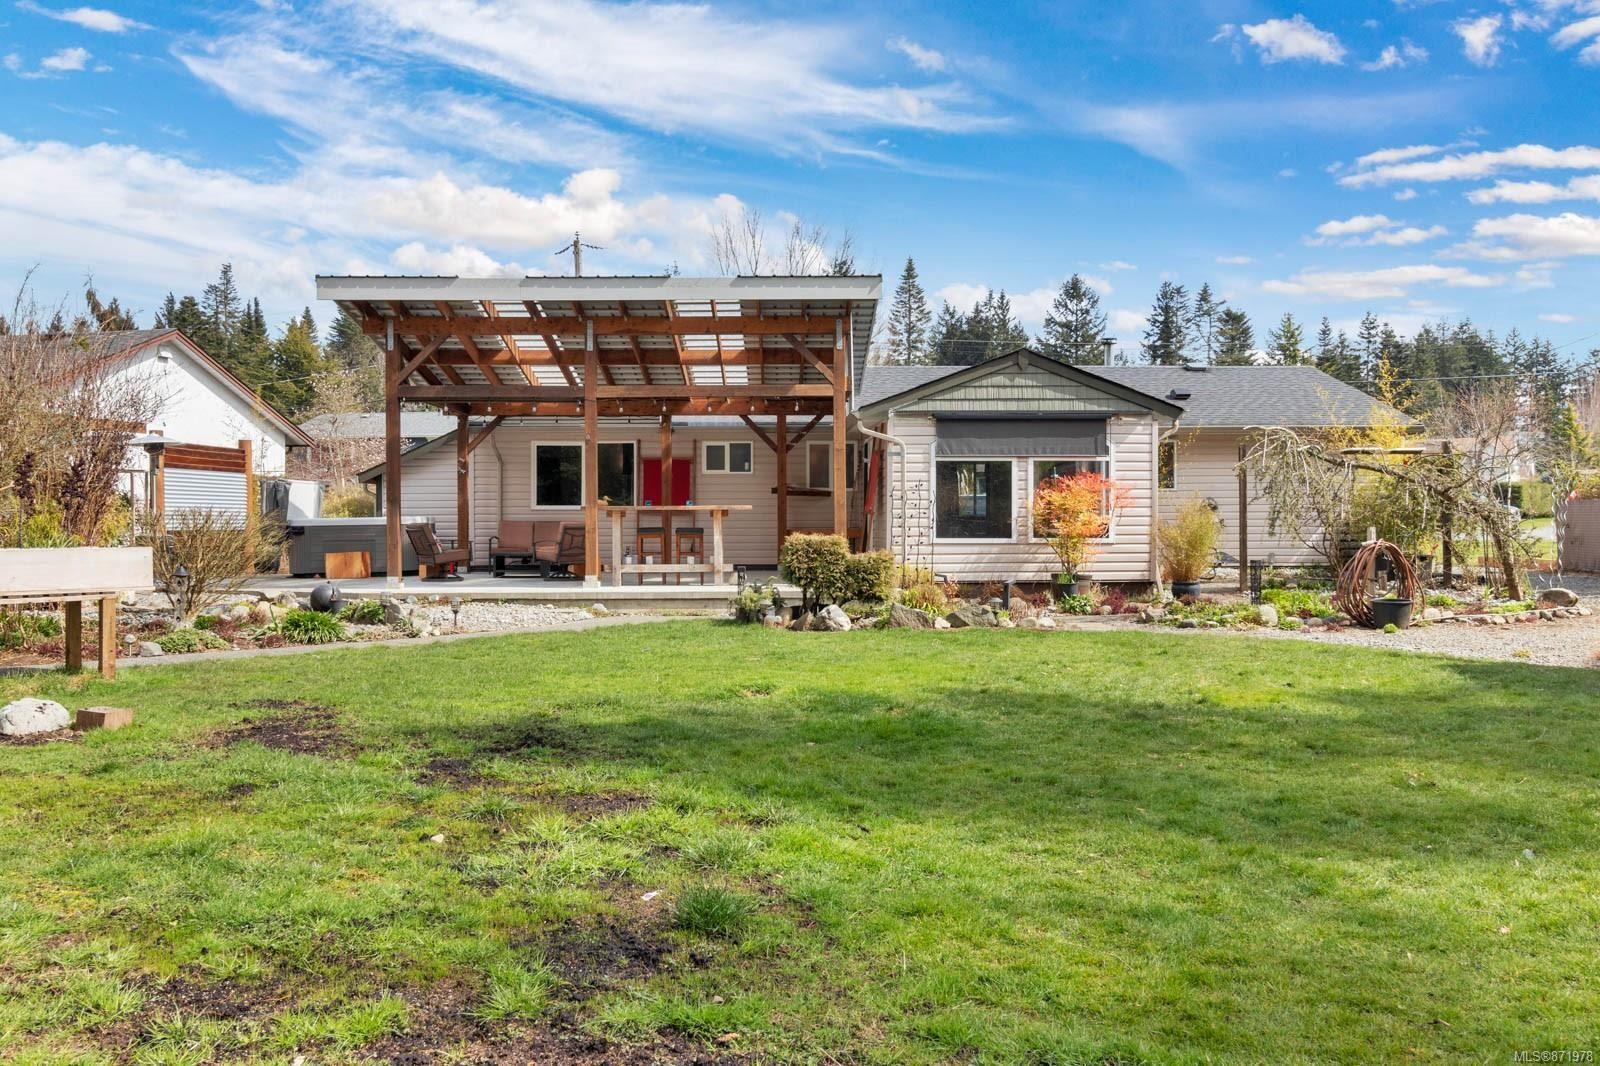 Photo 28: Photos: 1539 Chilcotin Cres in : CV Comox (Town of) House for sale (Comox Valley)  : MLS®# 871978